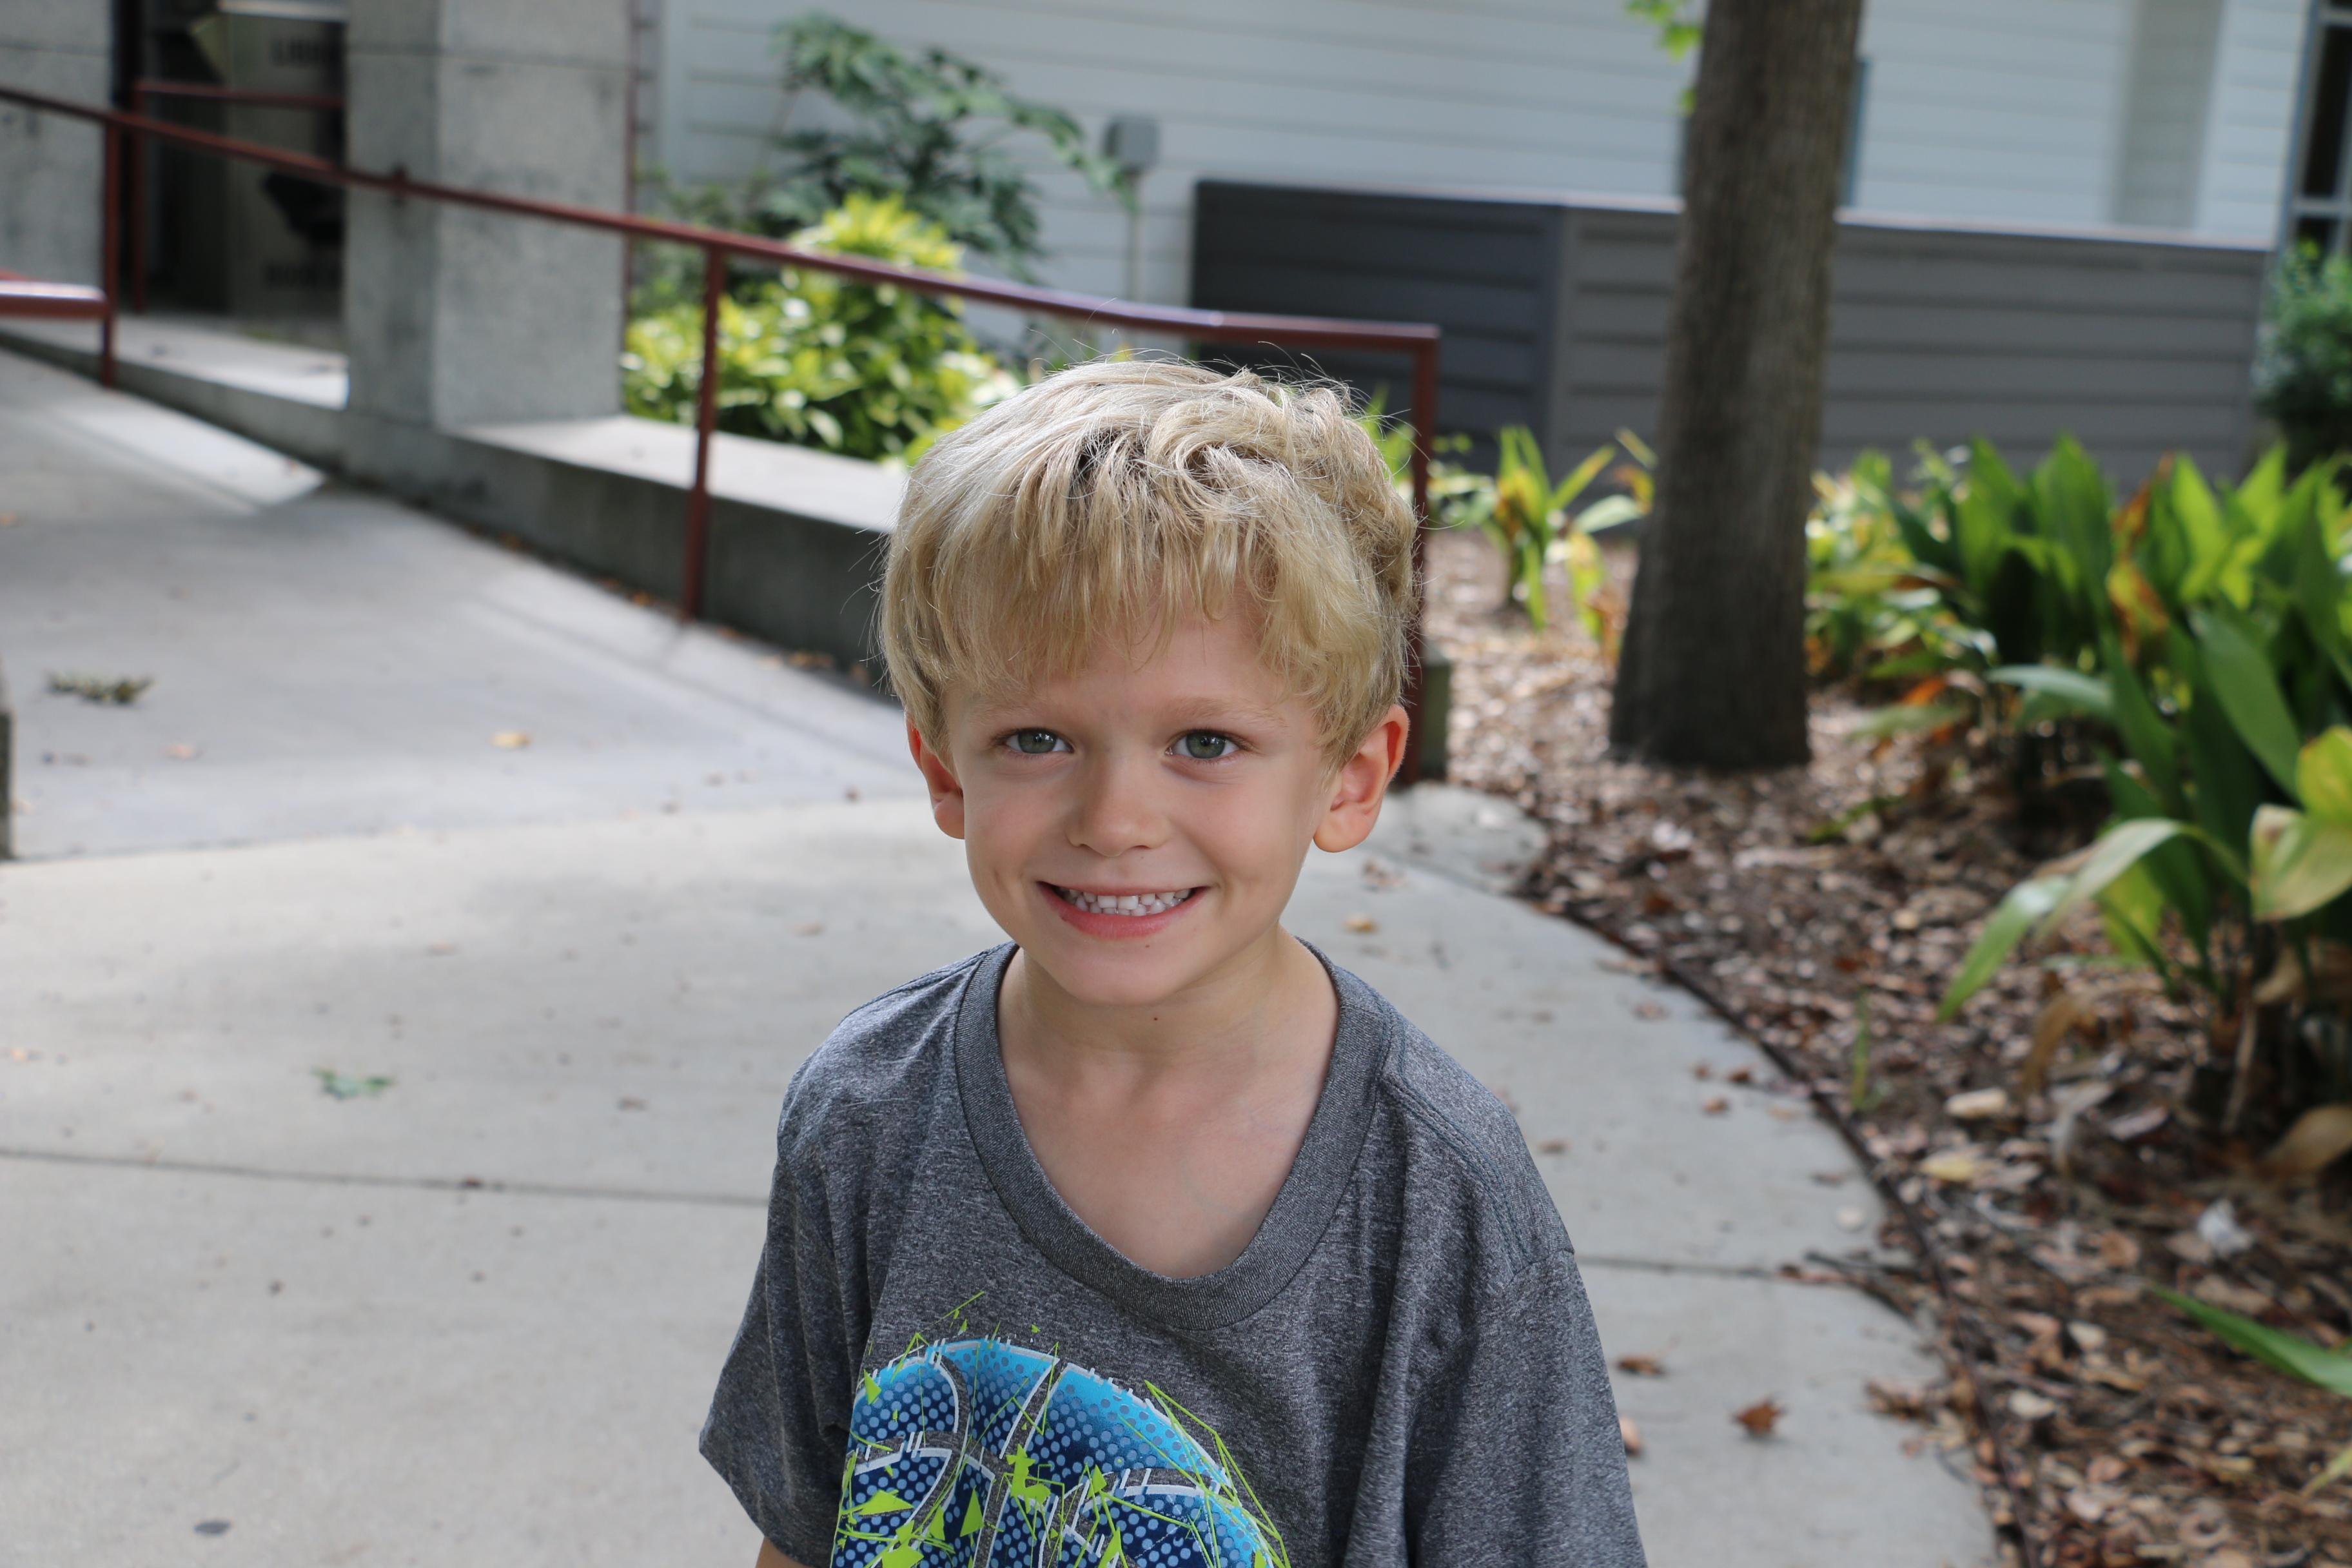 Extra recess. Nathaniel Age 5